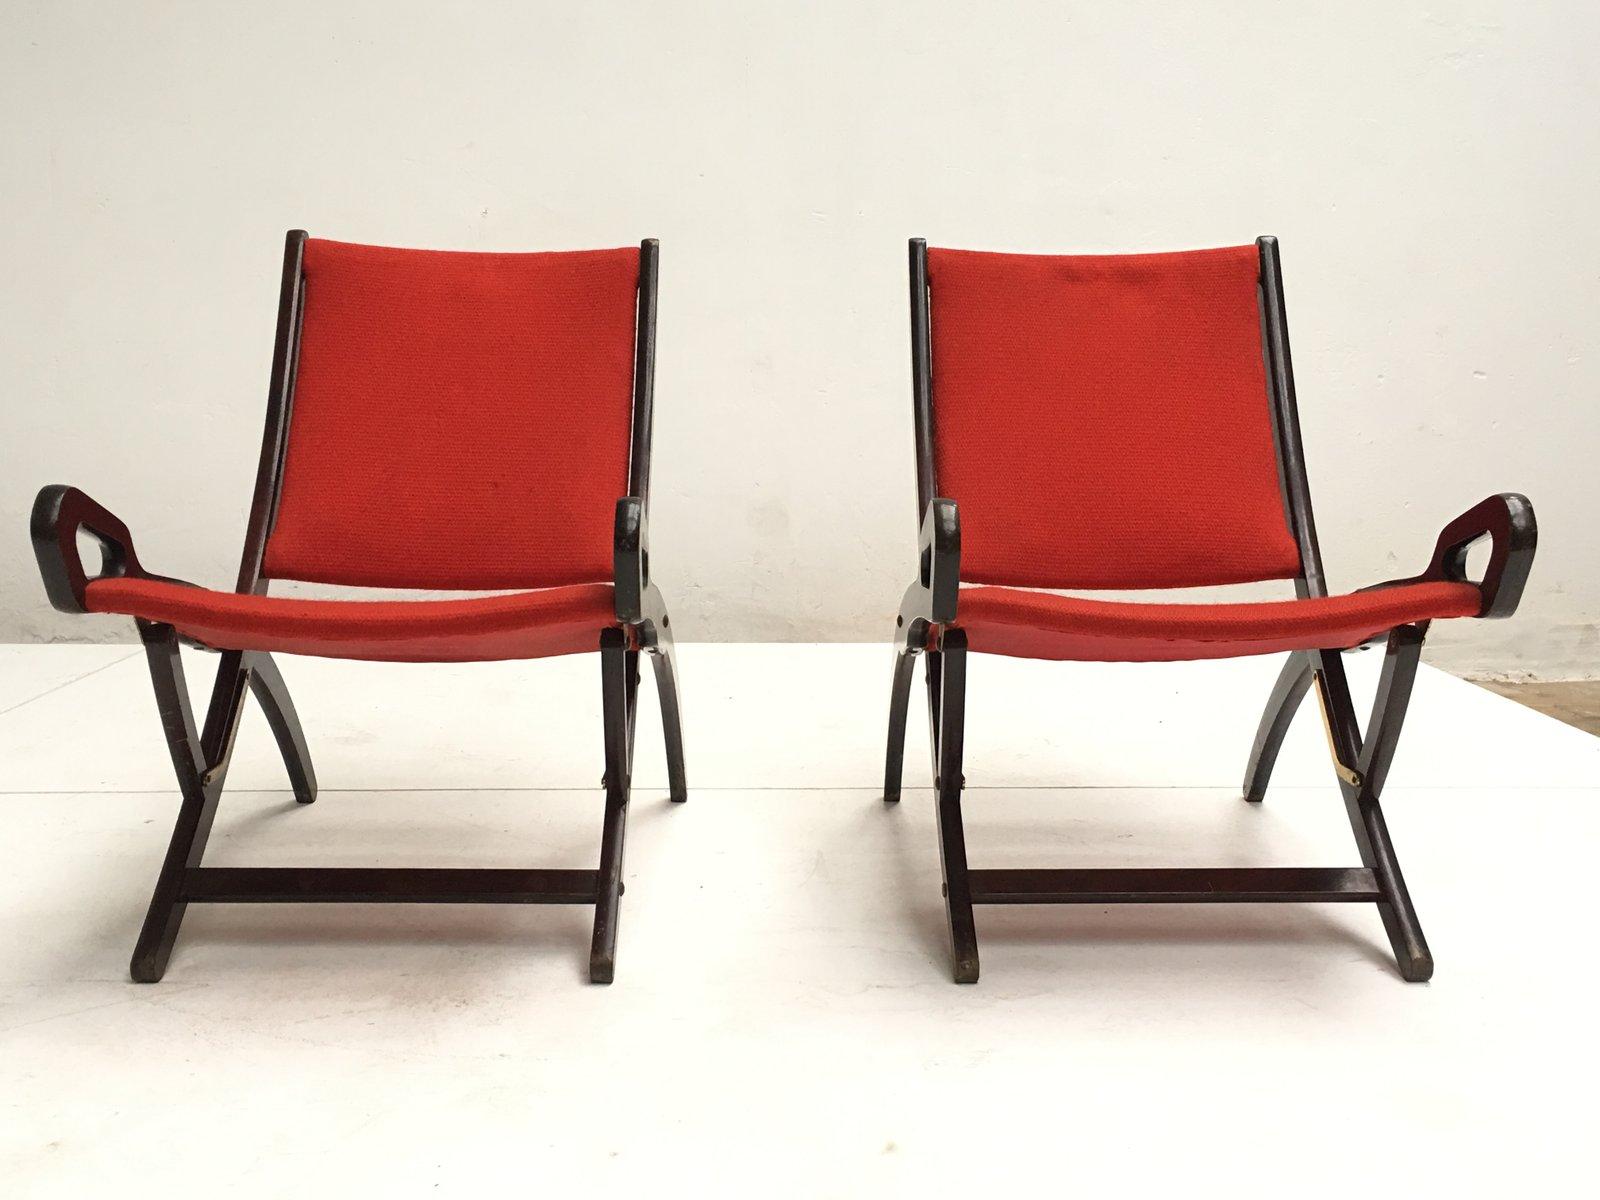 Sedia gio ponti prezzo cool ponti with sedia gio ponti prezzo